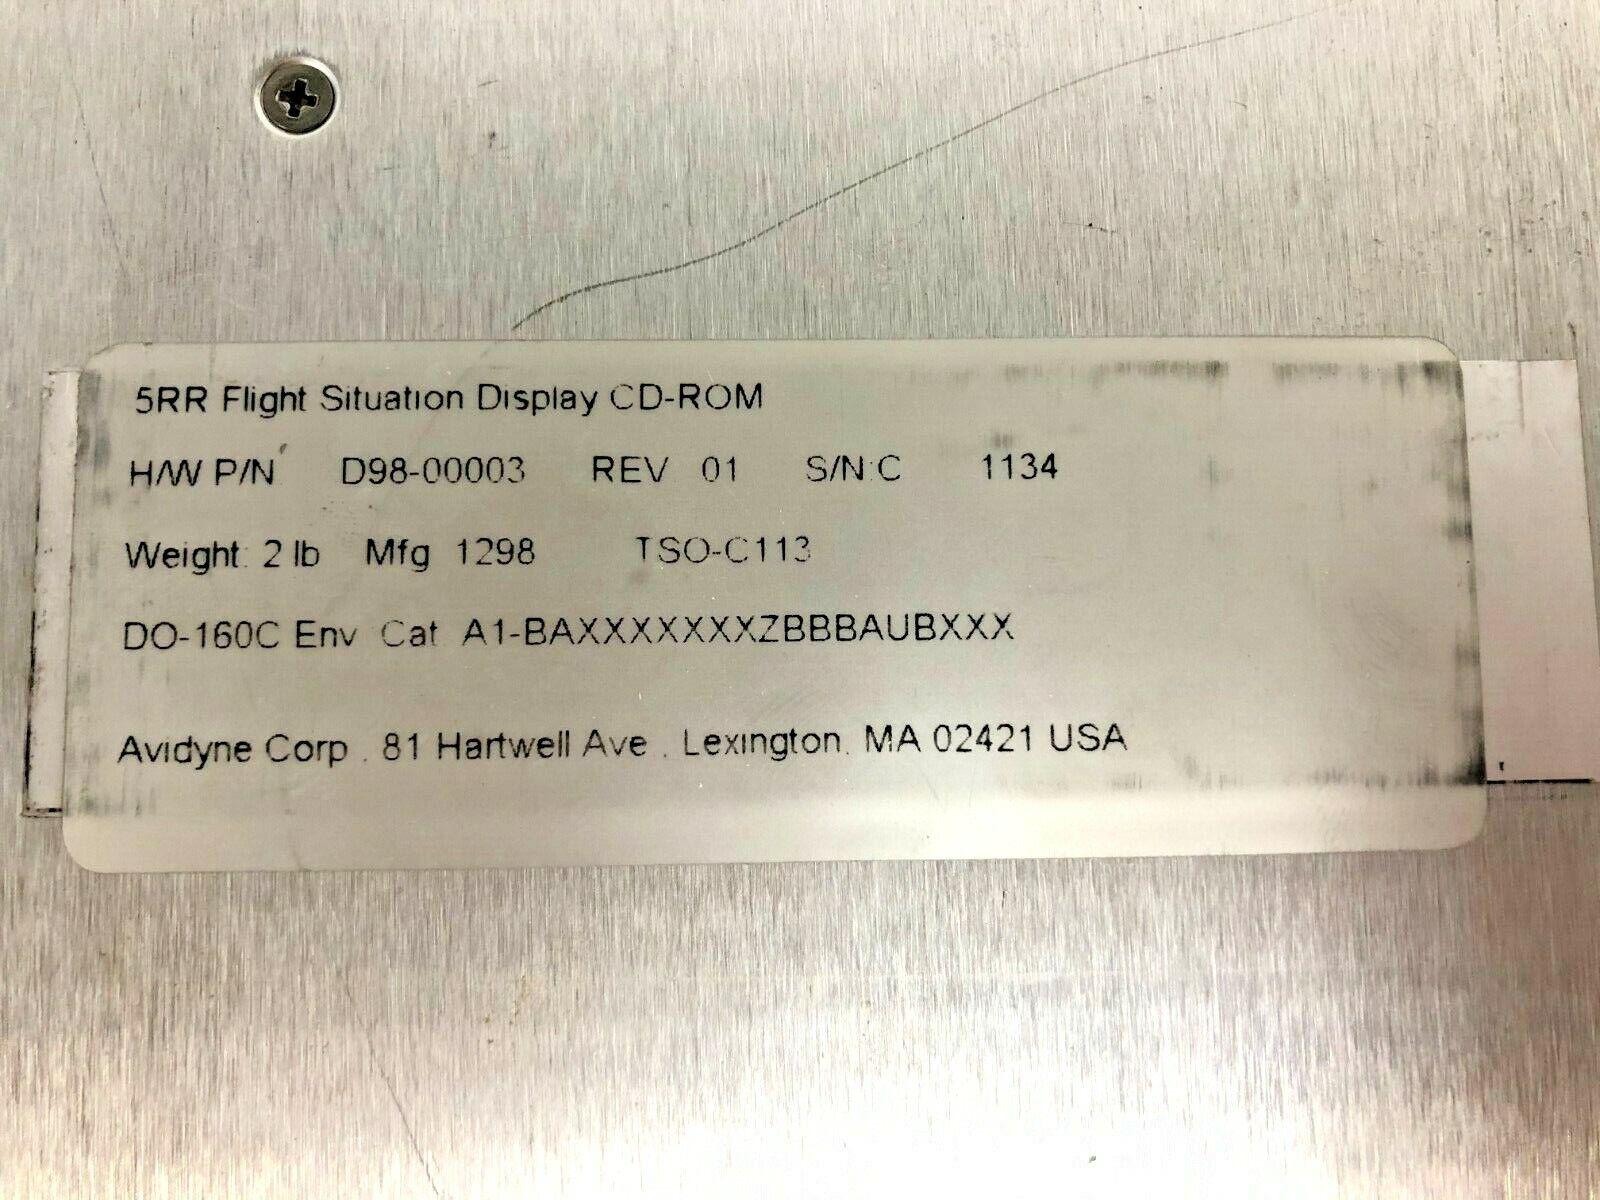 Avidyne 5RR Flight Situation Display CD-ROM P/N 530-0109-08